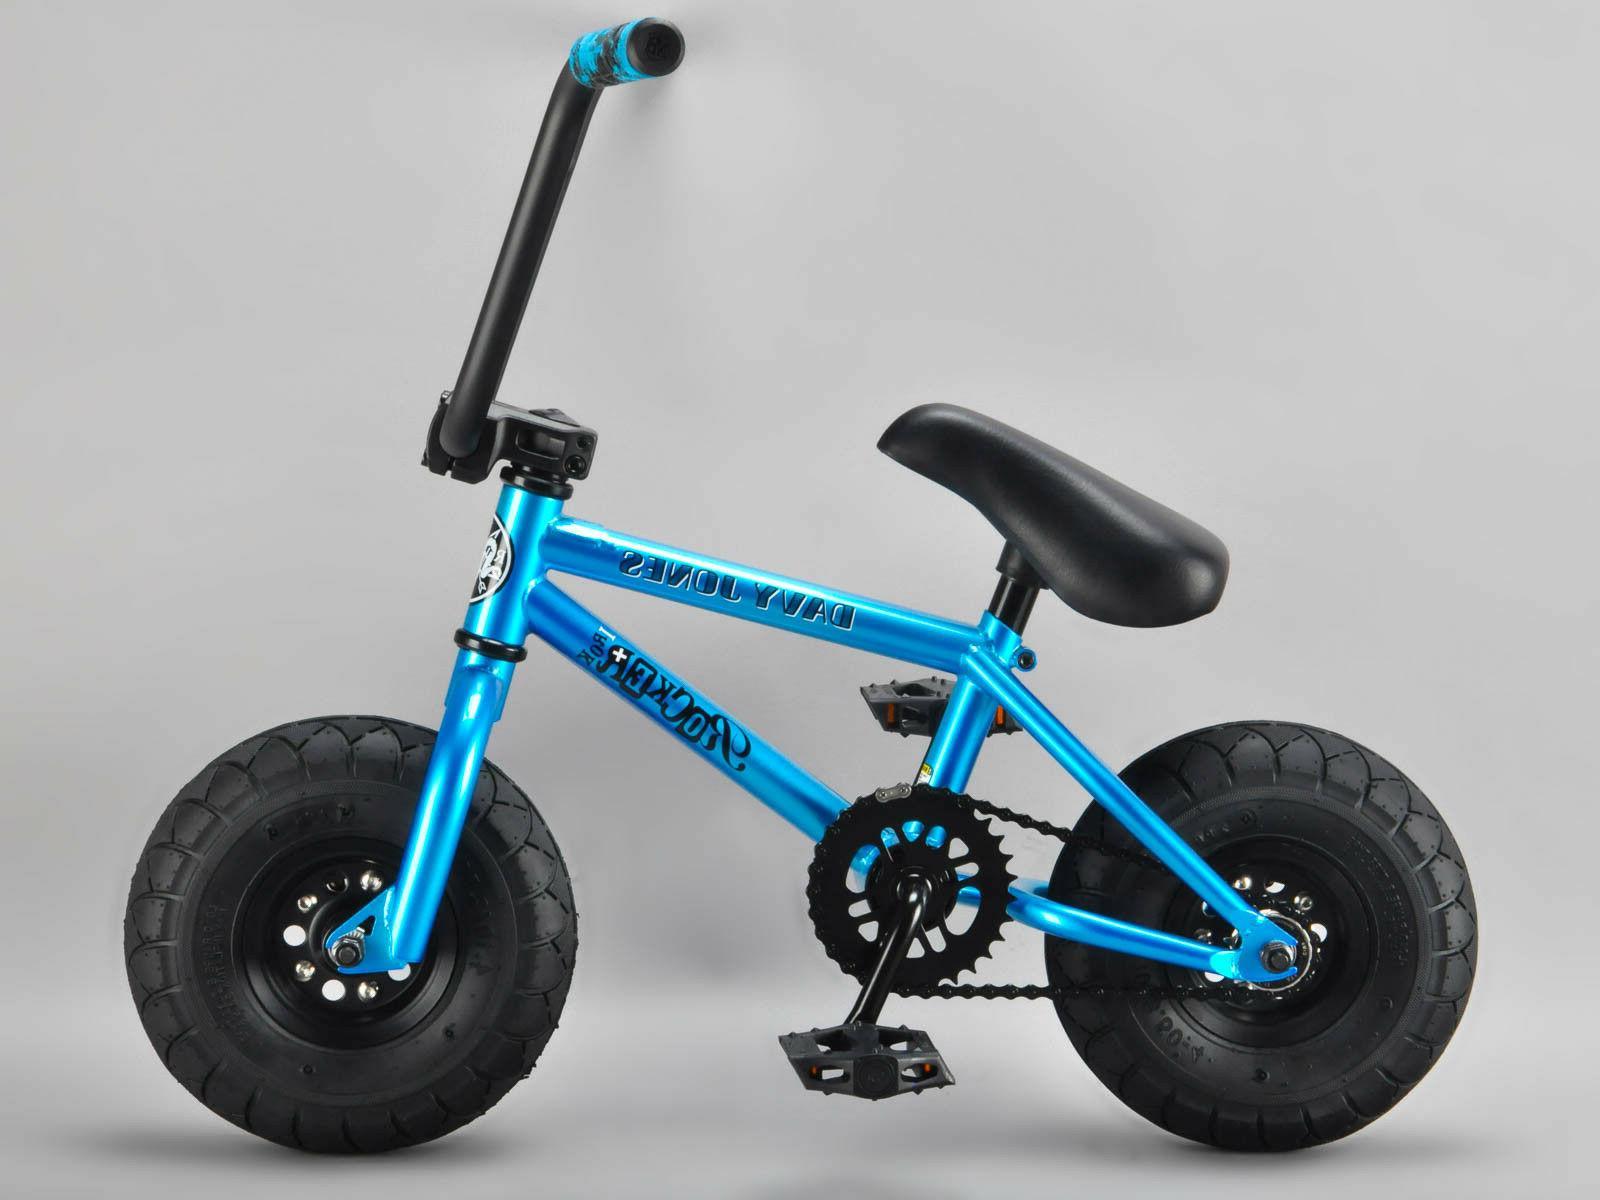 mini bike irok davy jones